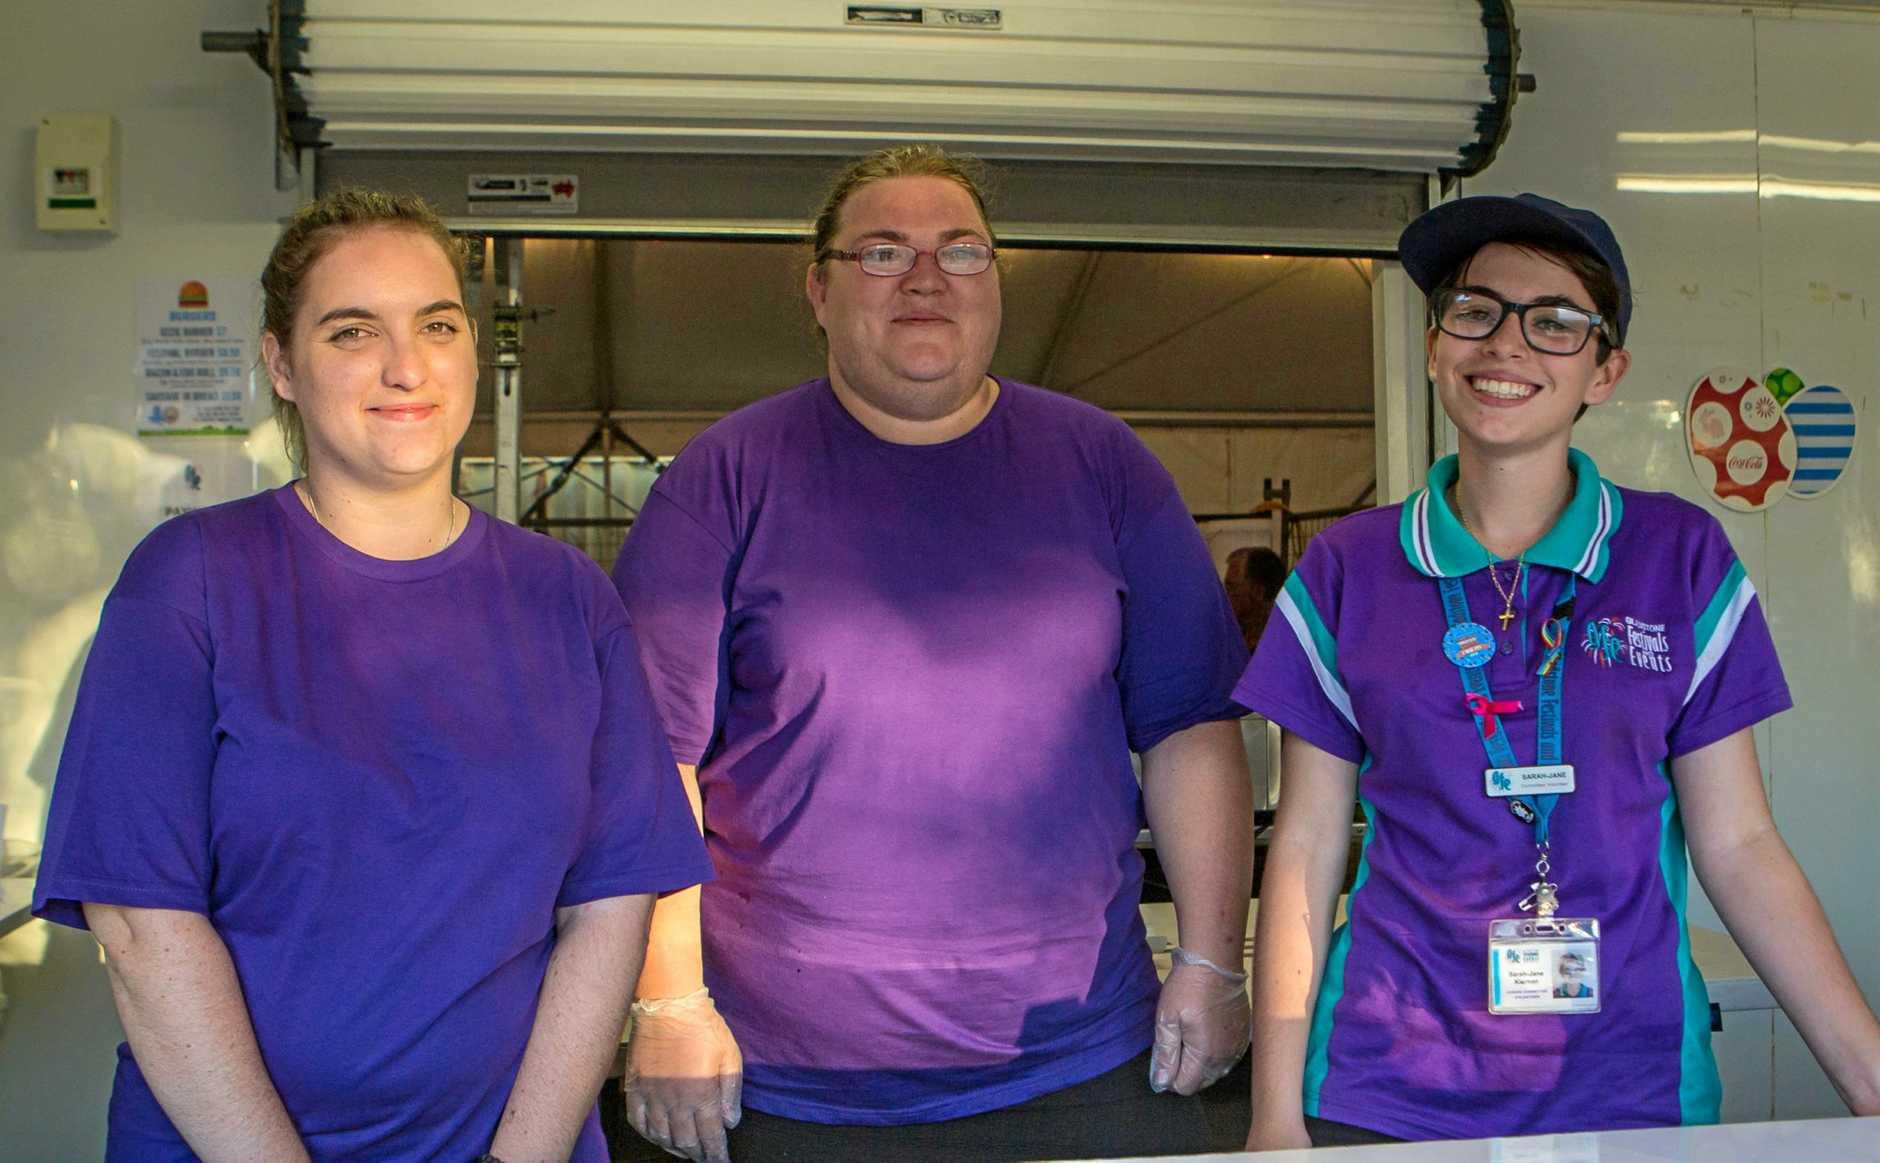 VOLUNTEERS: Kristen Murkett, Rebecca Murphy and committee member Sarah-Jane Kiernan at the 2019 Harbour Festival.